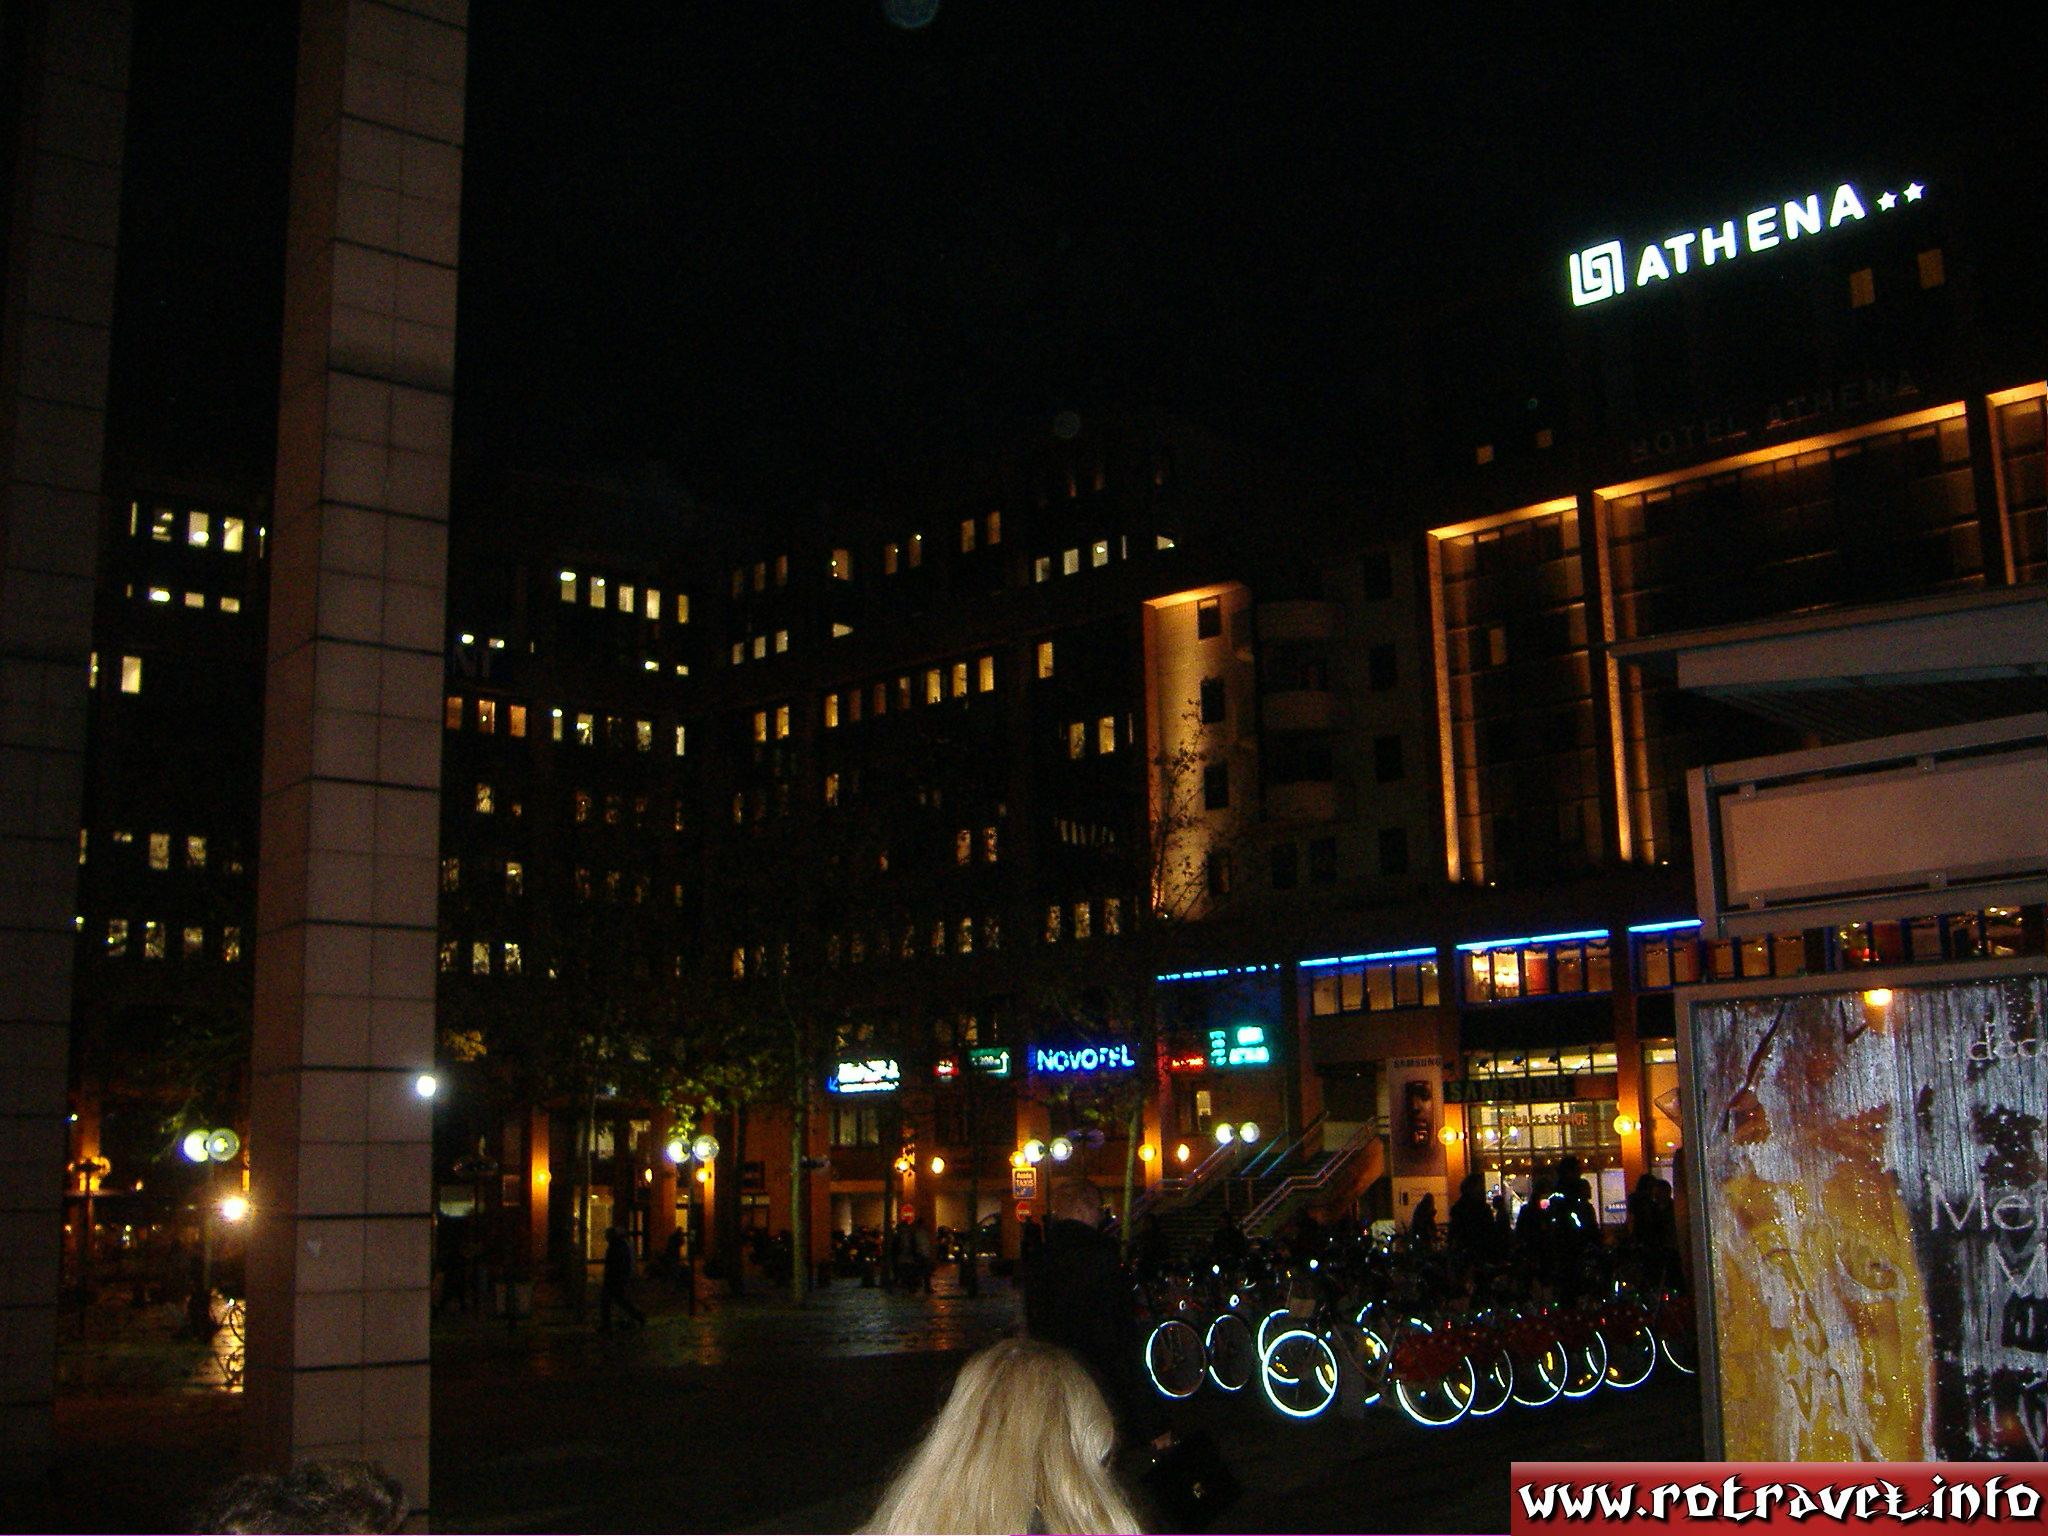 Near to the Athena Hotel